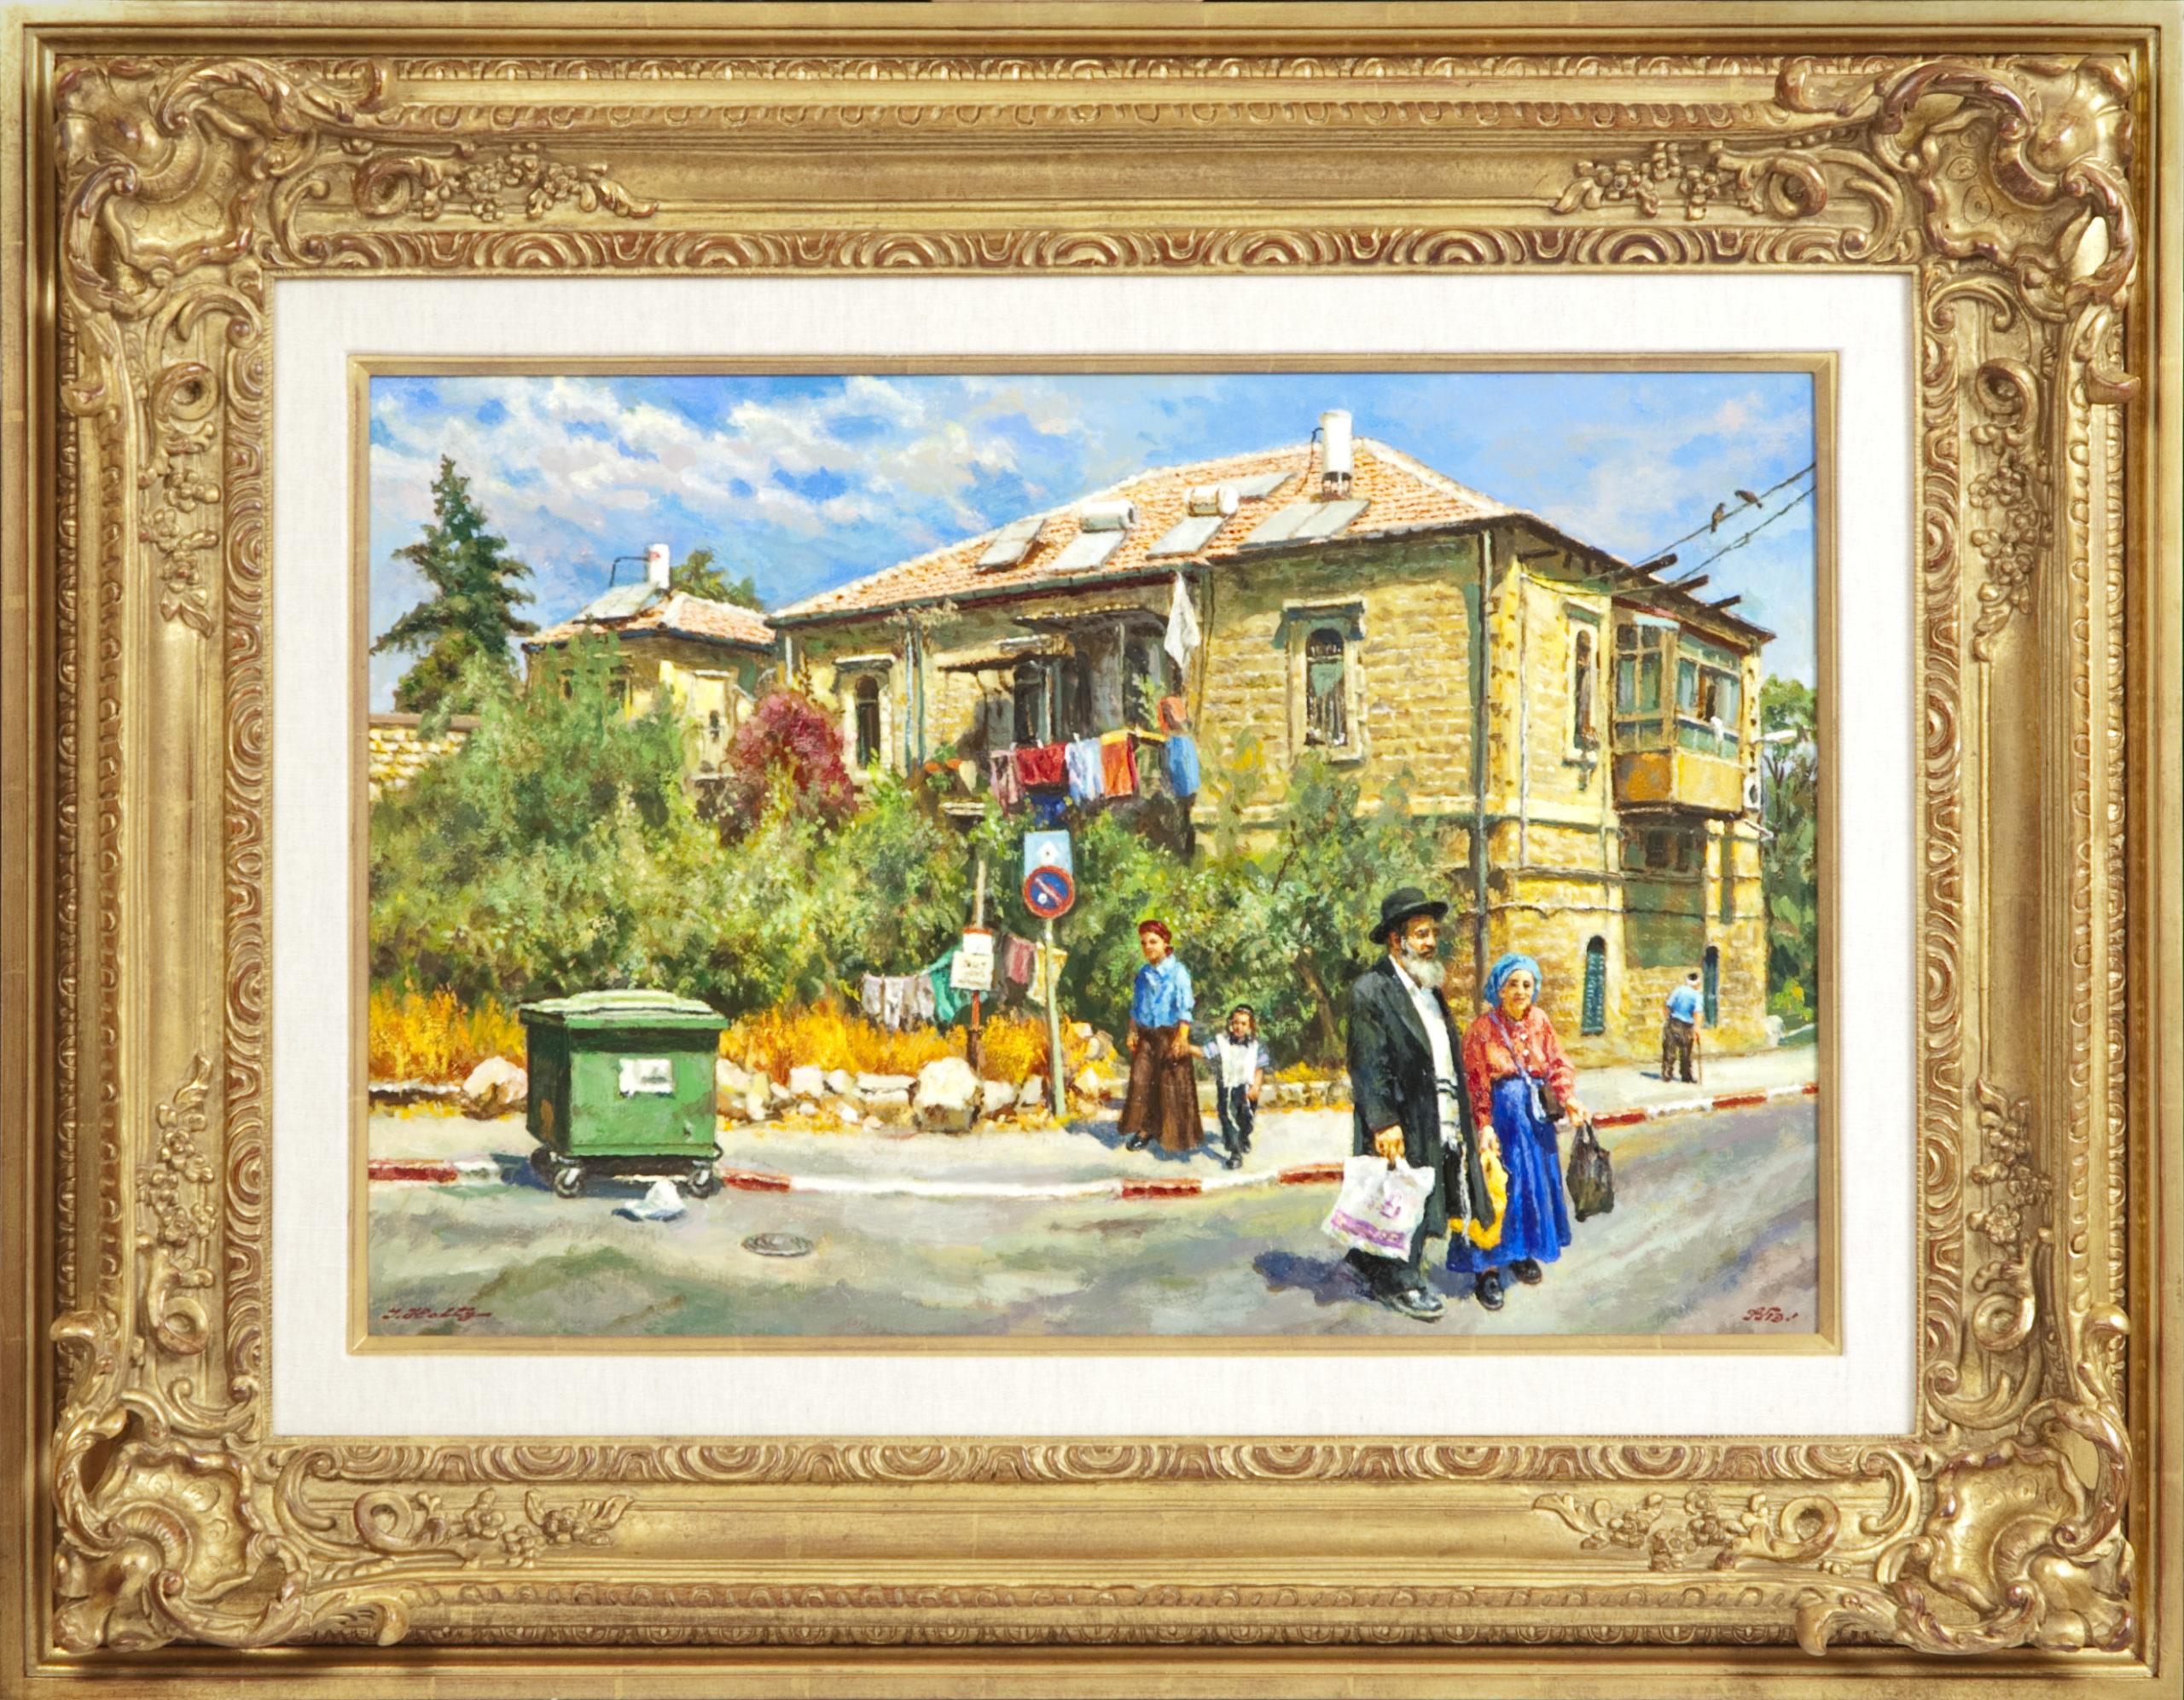 085 Narkiss Street Jerusalem 2008 - Oil on Canvas - 24 x 16 - Frame: 35 x 27.5 x 3.5